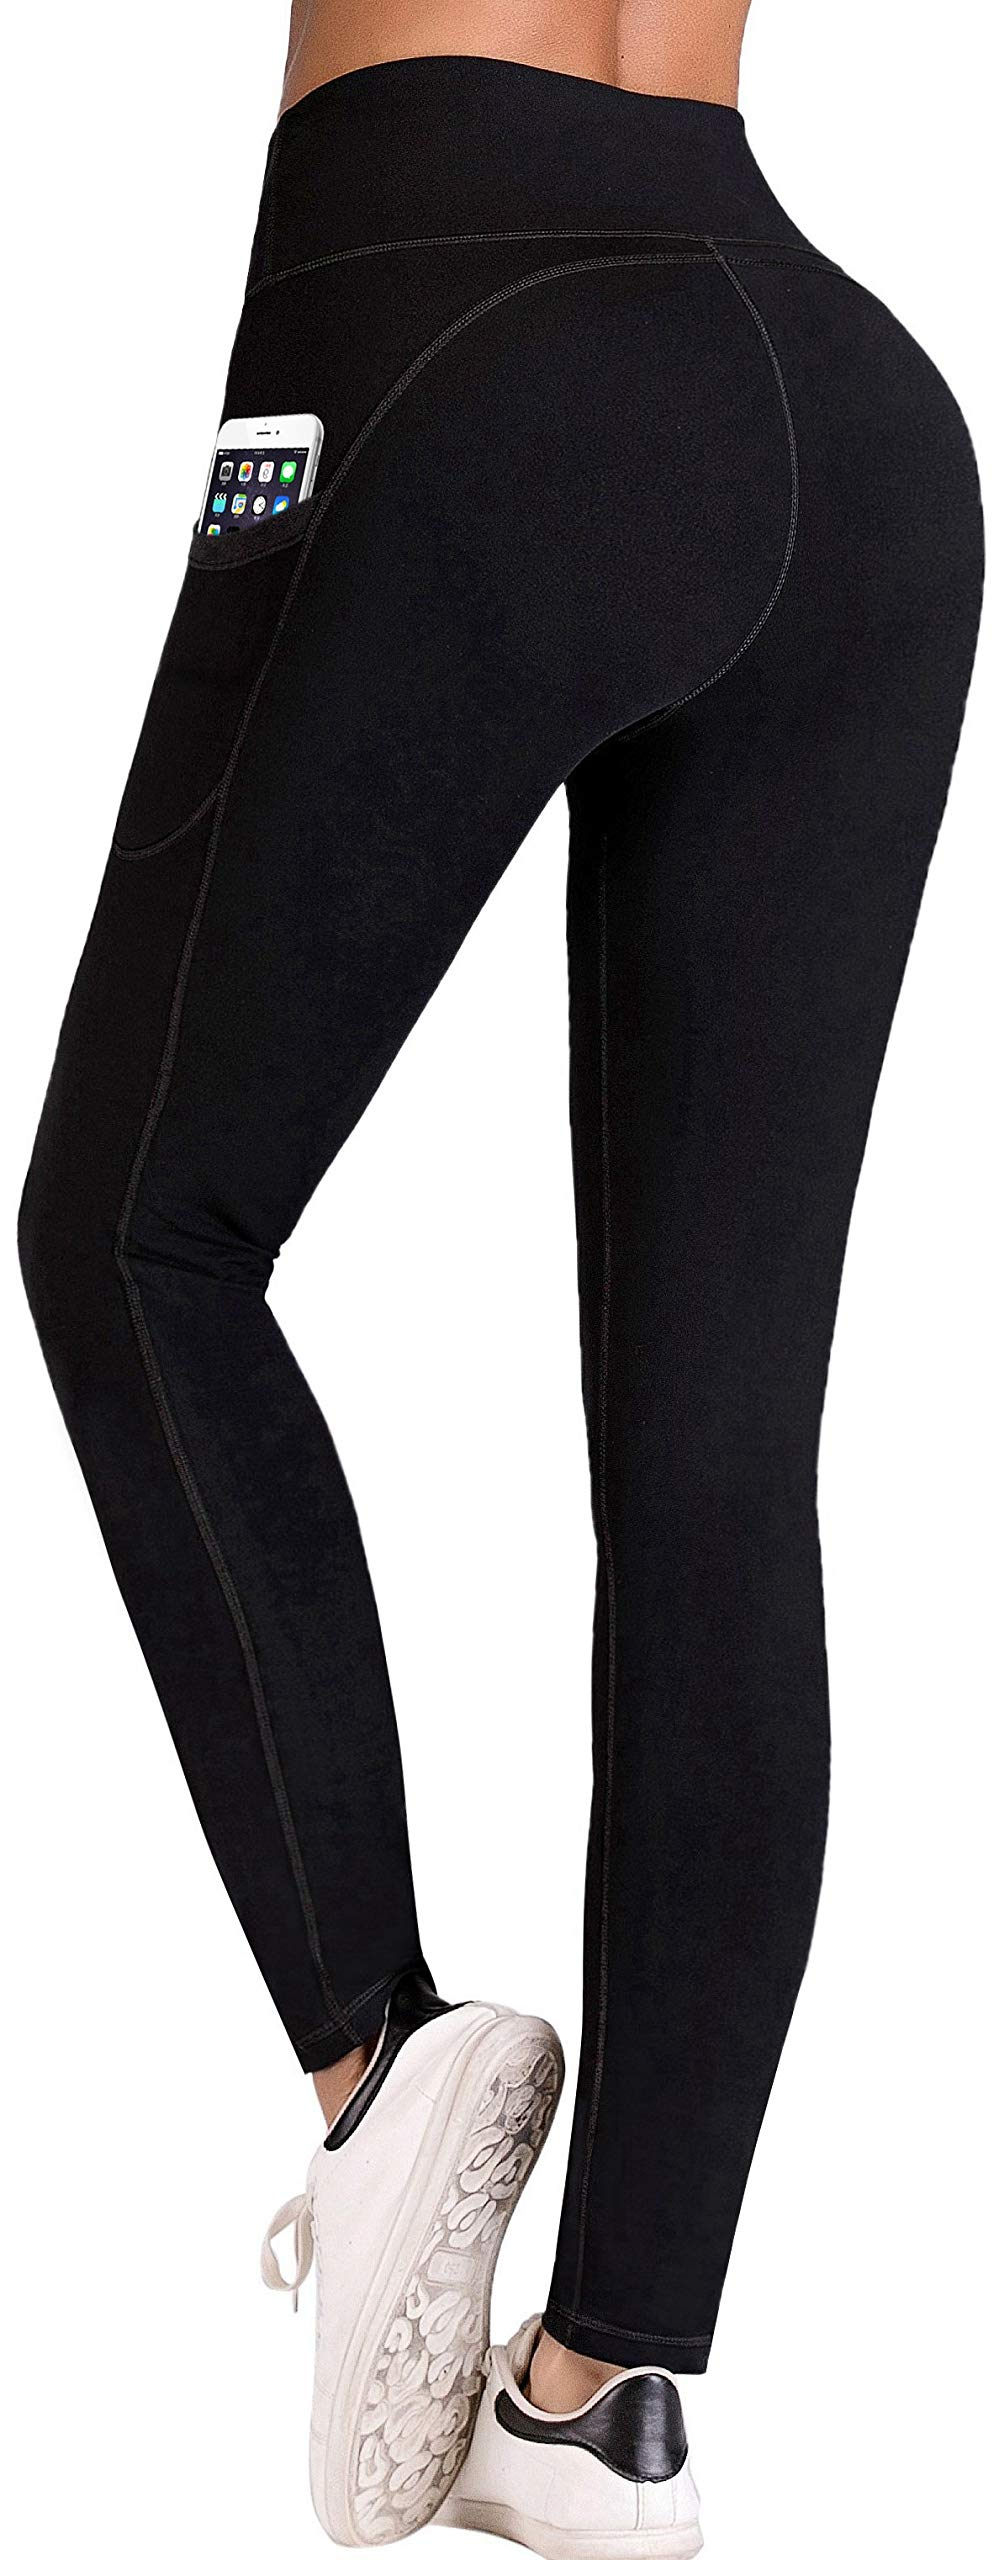 b615ffec7b6eff Best Rated in Women s Running Pants   Helpful Customer Reviews ...